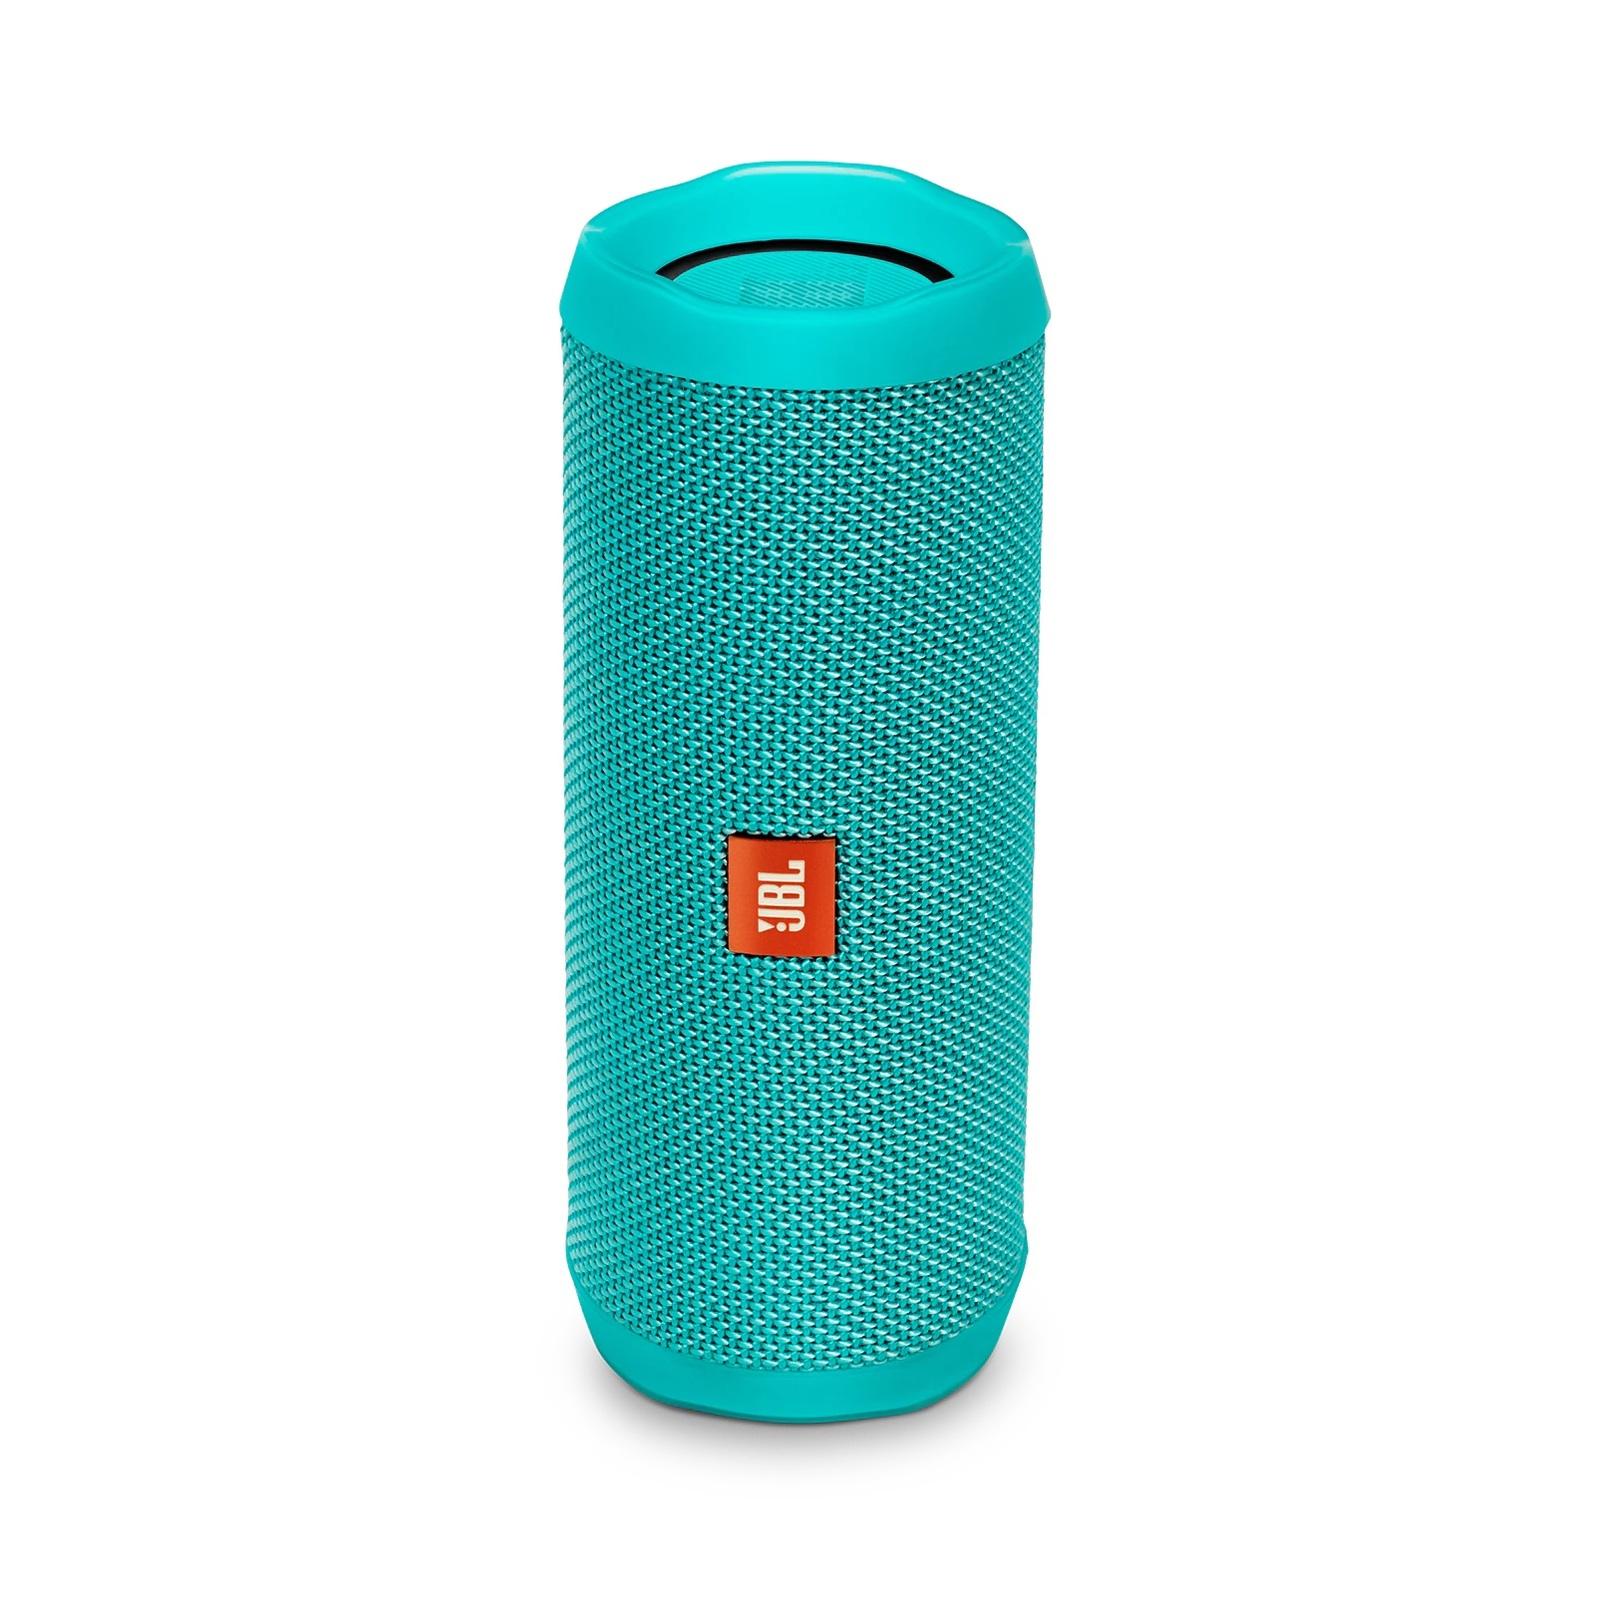 JBL Flip 4 Speaker Bluetooth Speaker - Teal image